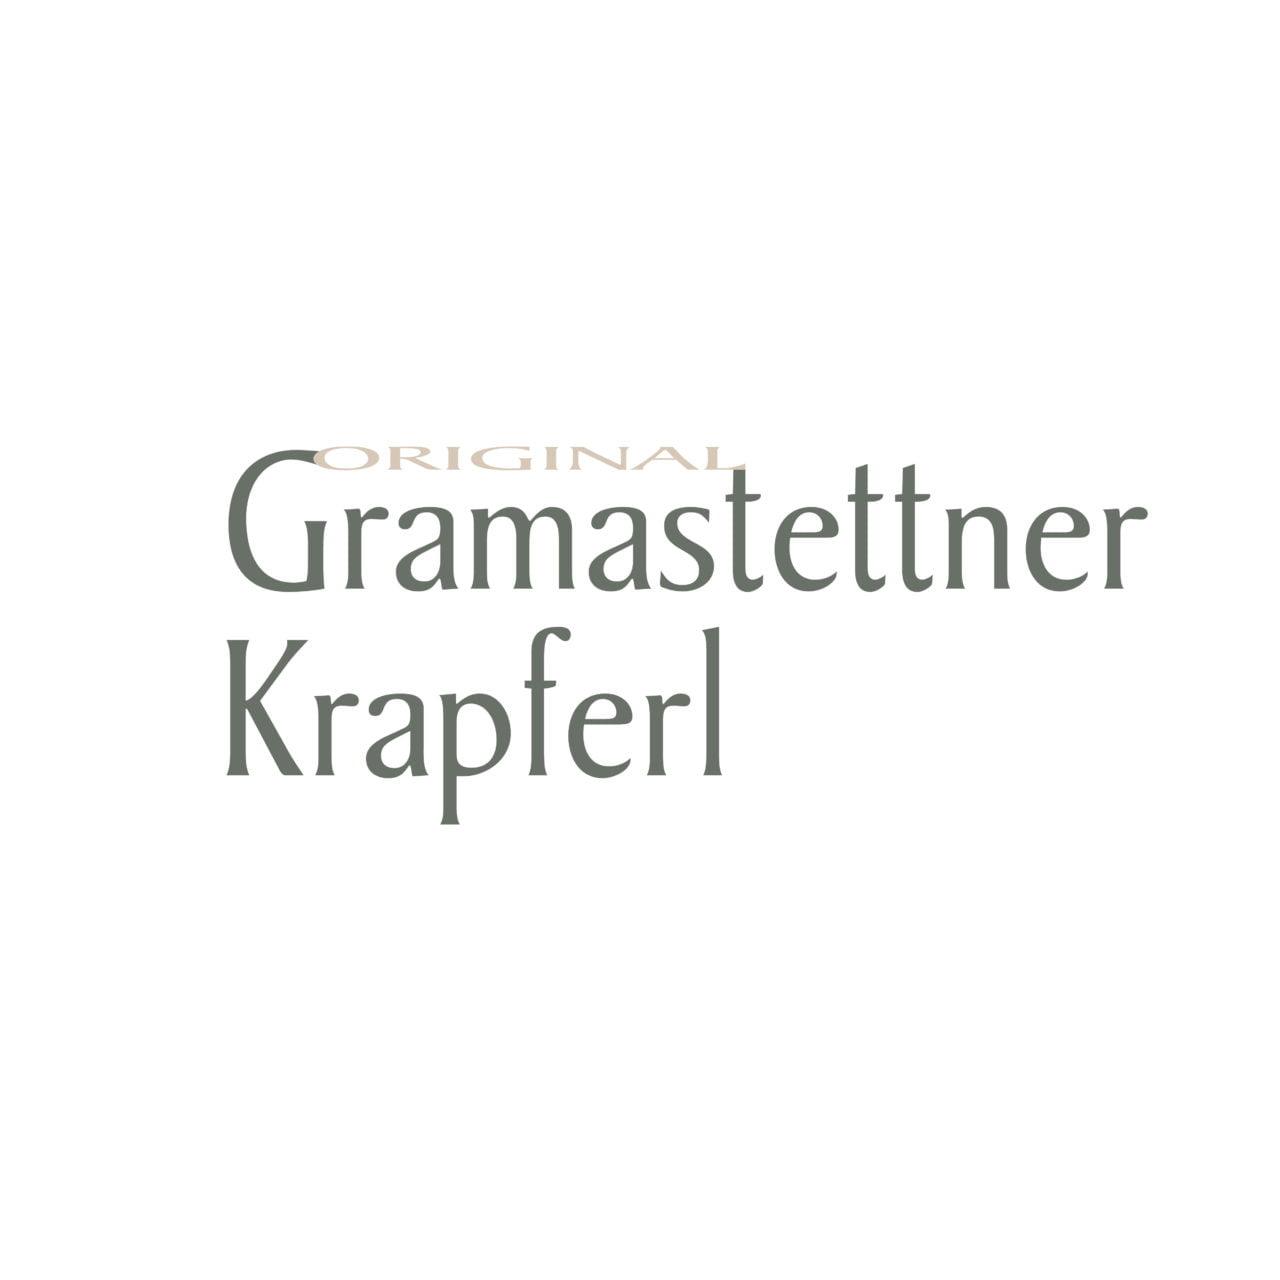 https://www.hummels-krapferl.at/wp-content/uploads/2019/08/Presse_2-1280x1280.jpg